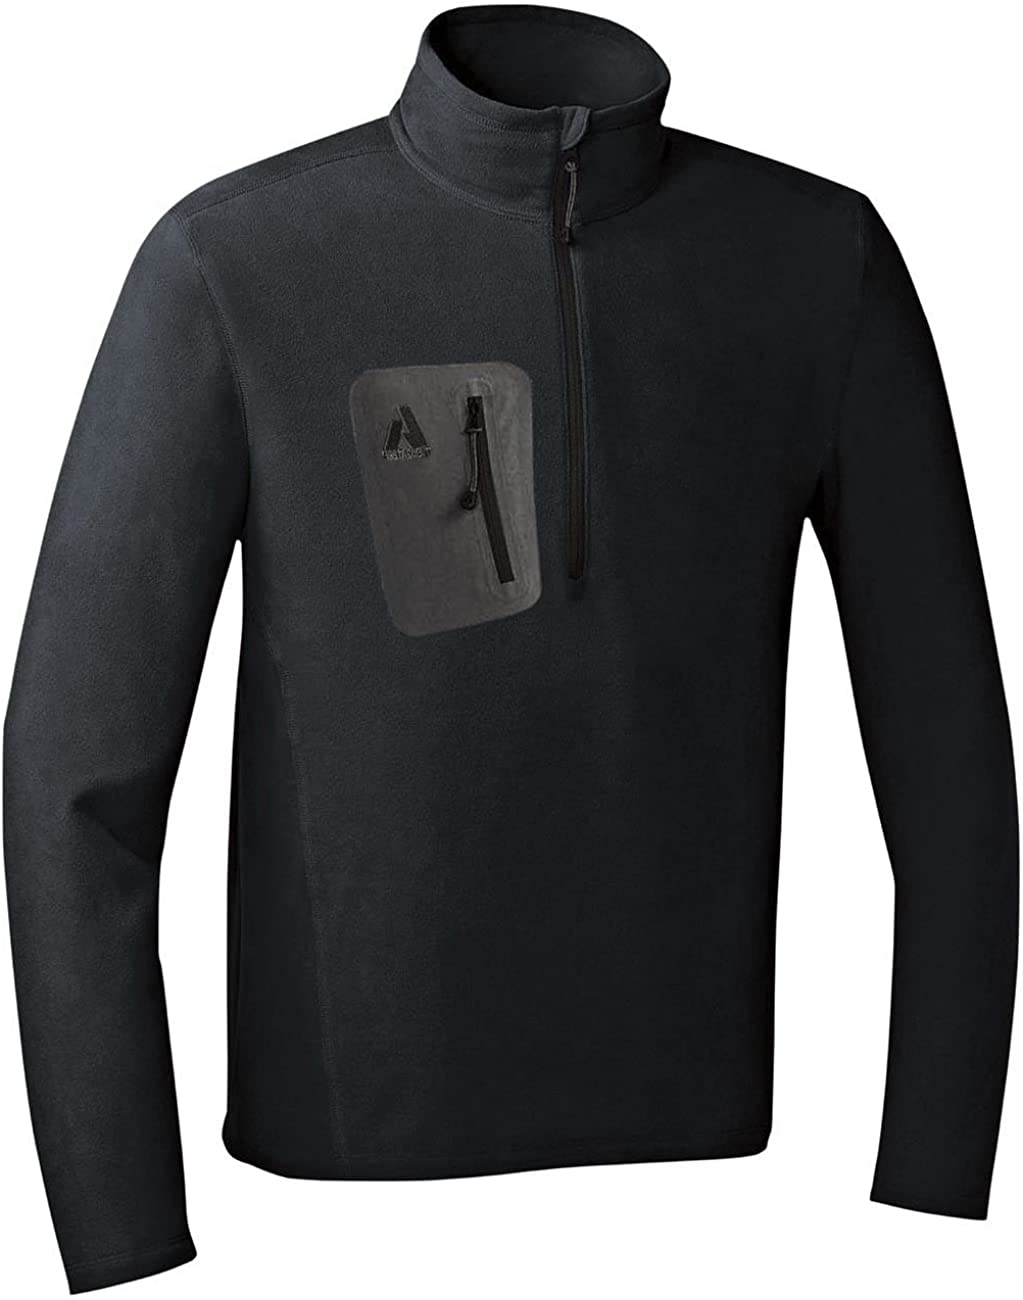 Eddie Bauer - First Ascent Men's Cloud Layer Fleece 1/4 Zip Pullover Jacket